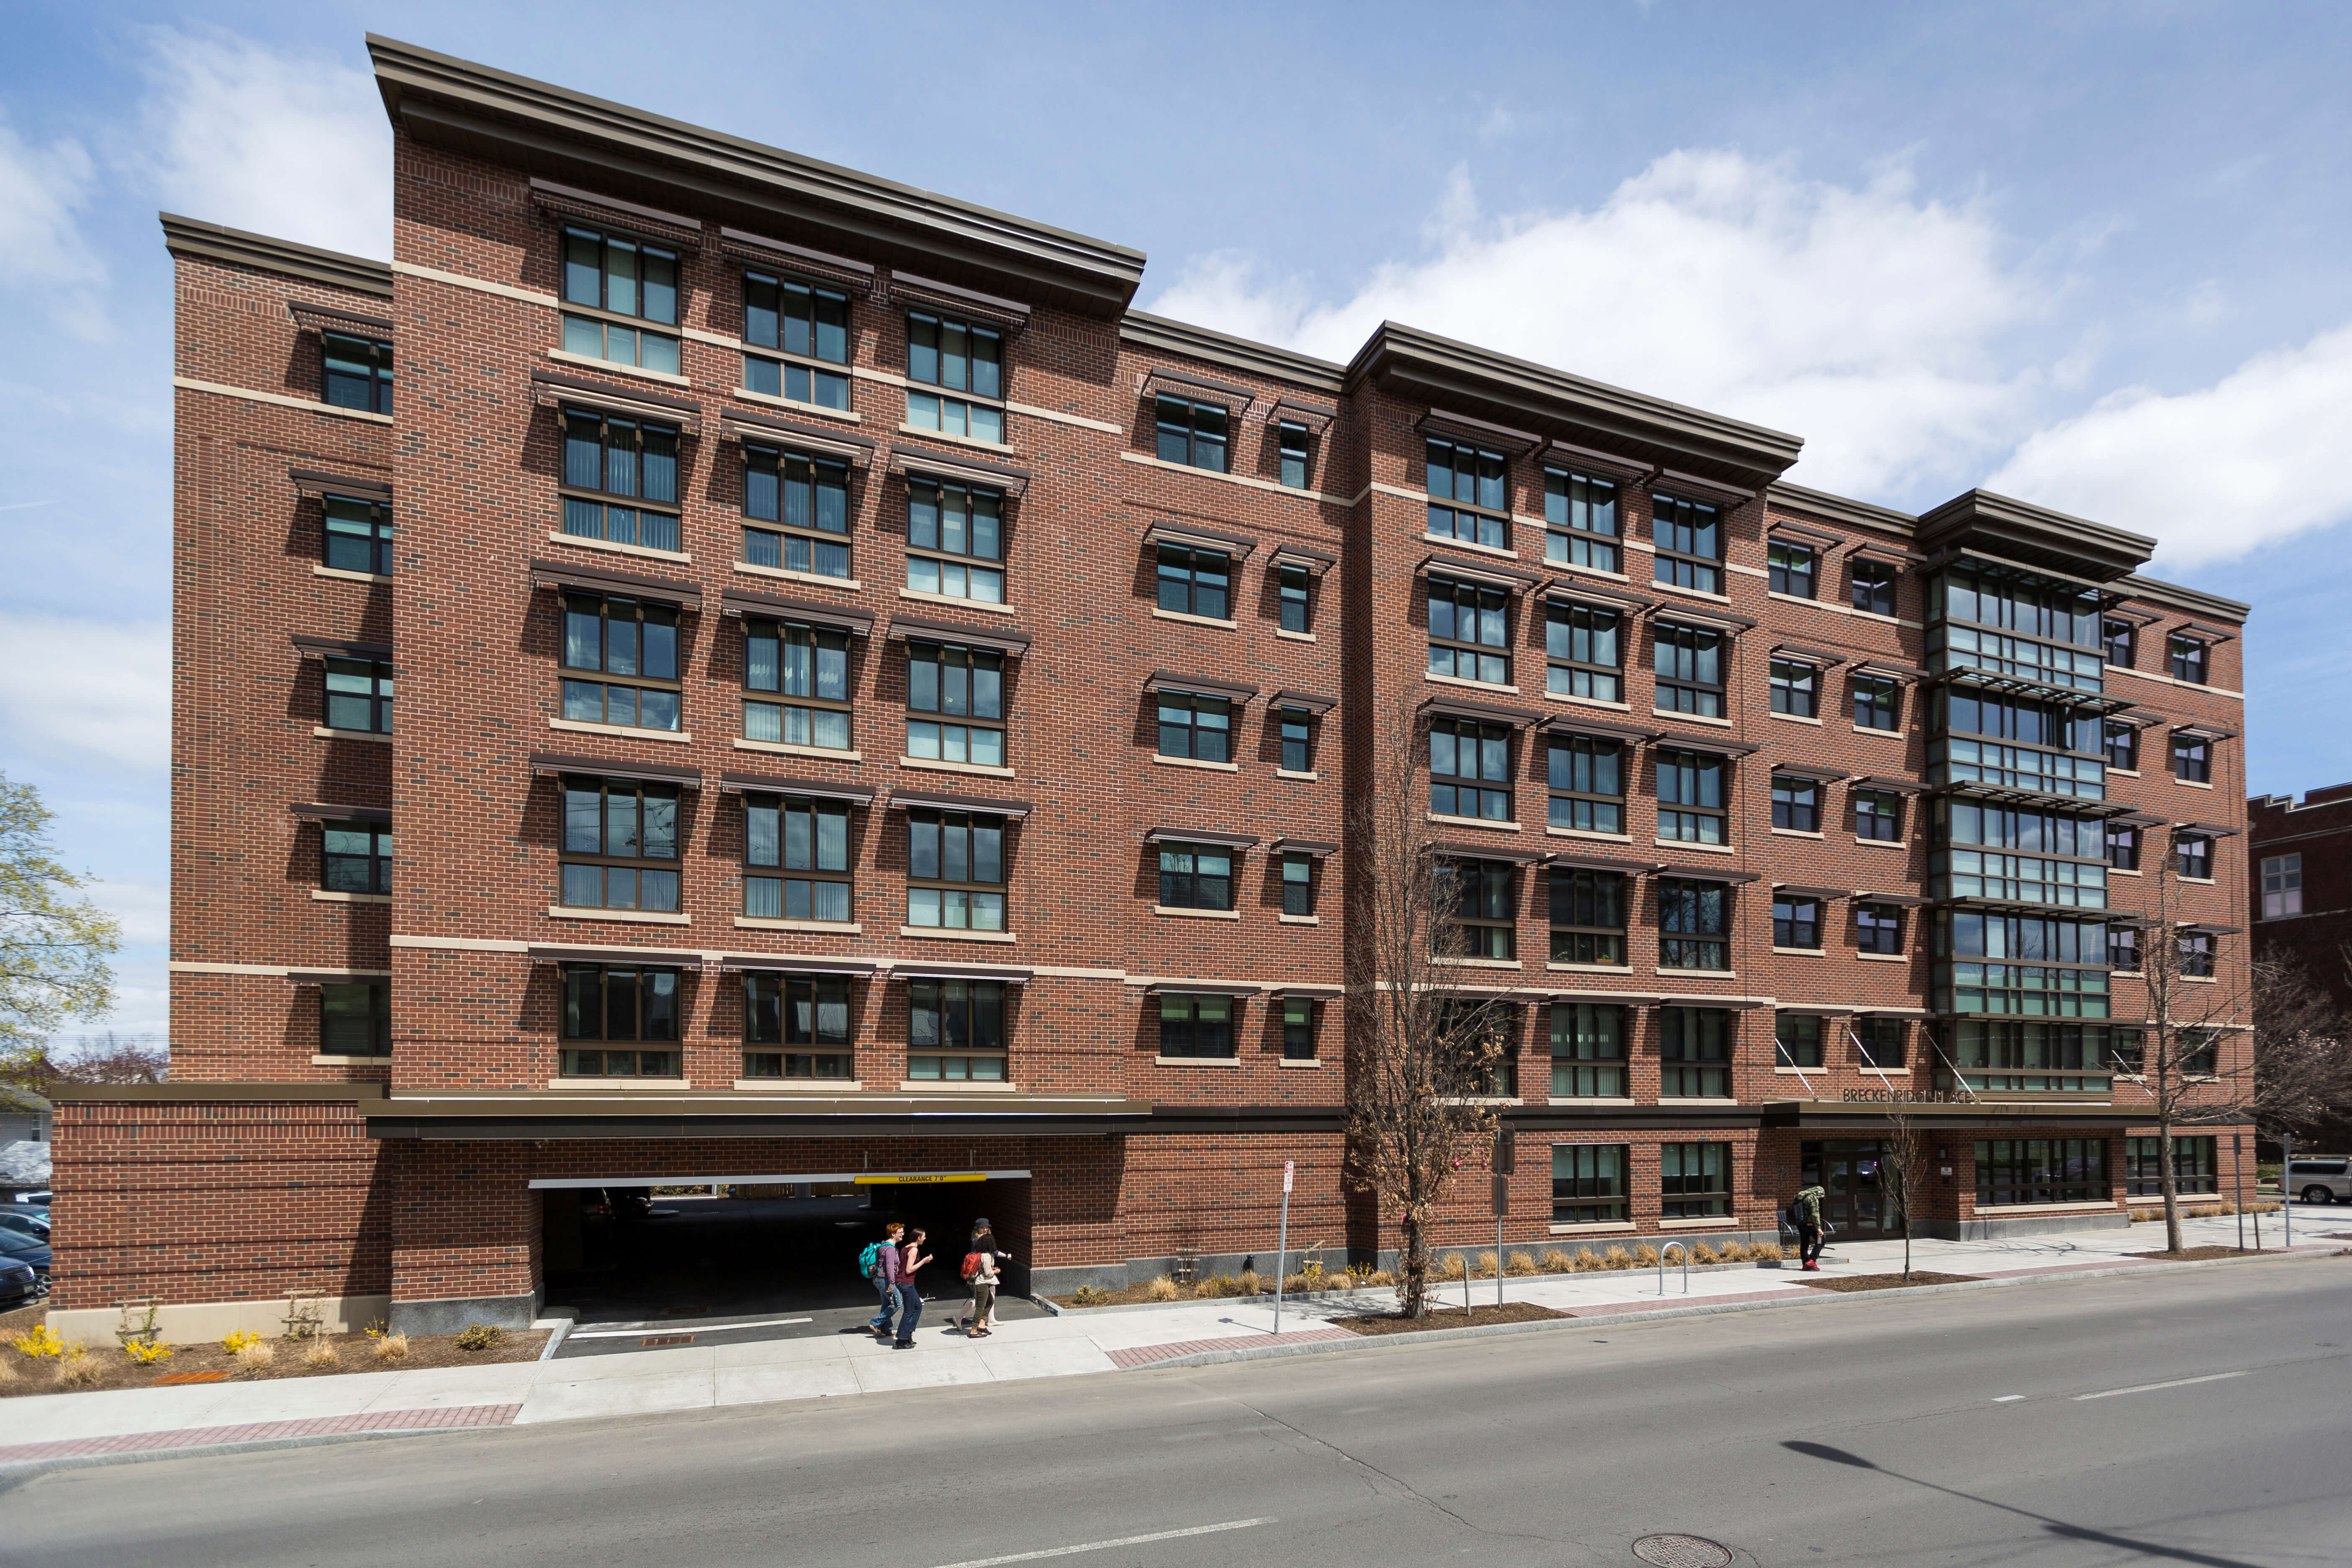 INHS Breckenridge Place Exterior 20140428GH1